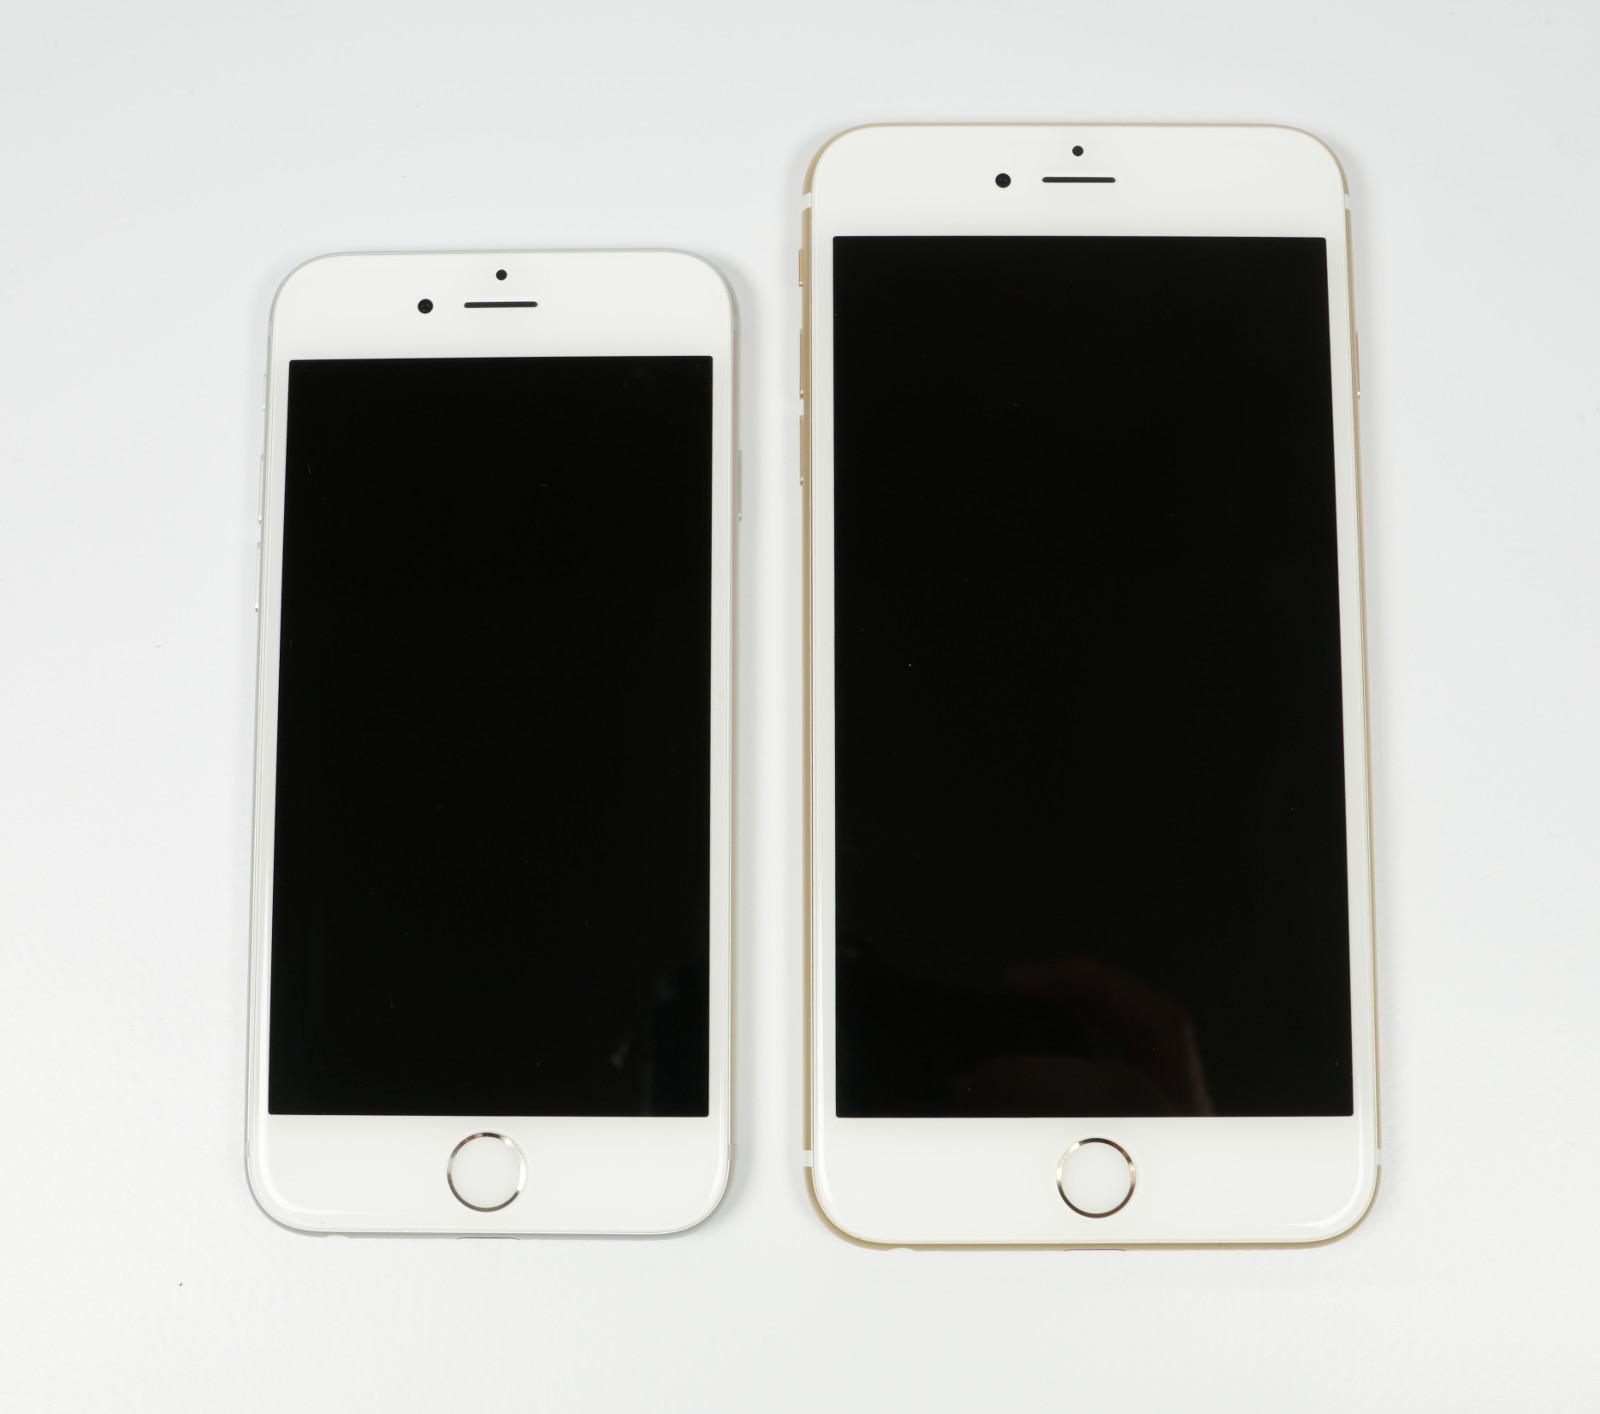 apple iphone 6s plus test die kamera ist entscheidend. Black Bedroom Furniture Sets. Home Design Ideas